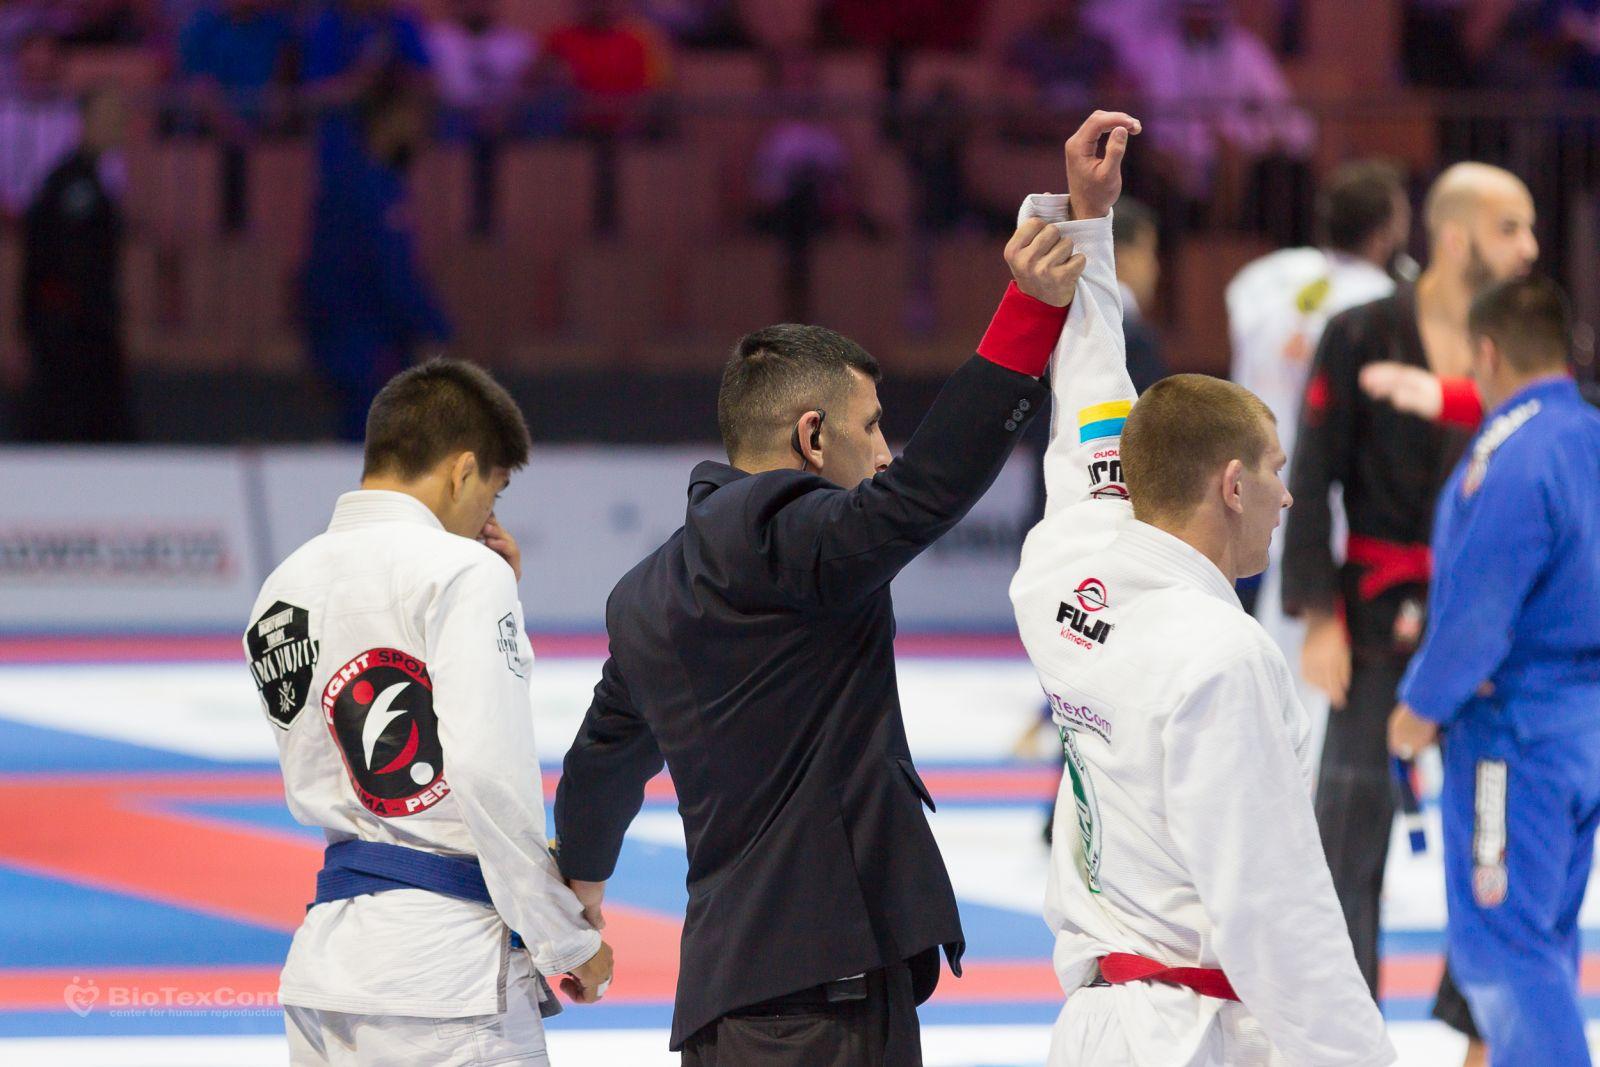 blazhko-yaroslav_Abu-Dhabi-World-Championship-2017-2_32